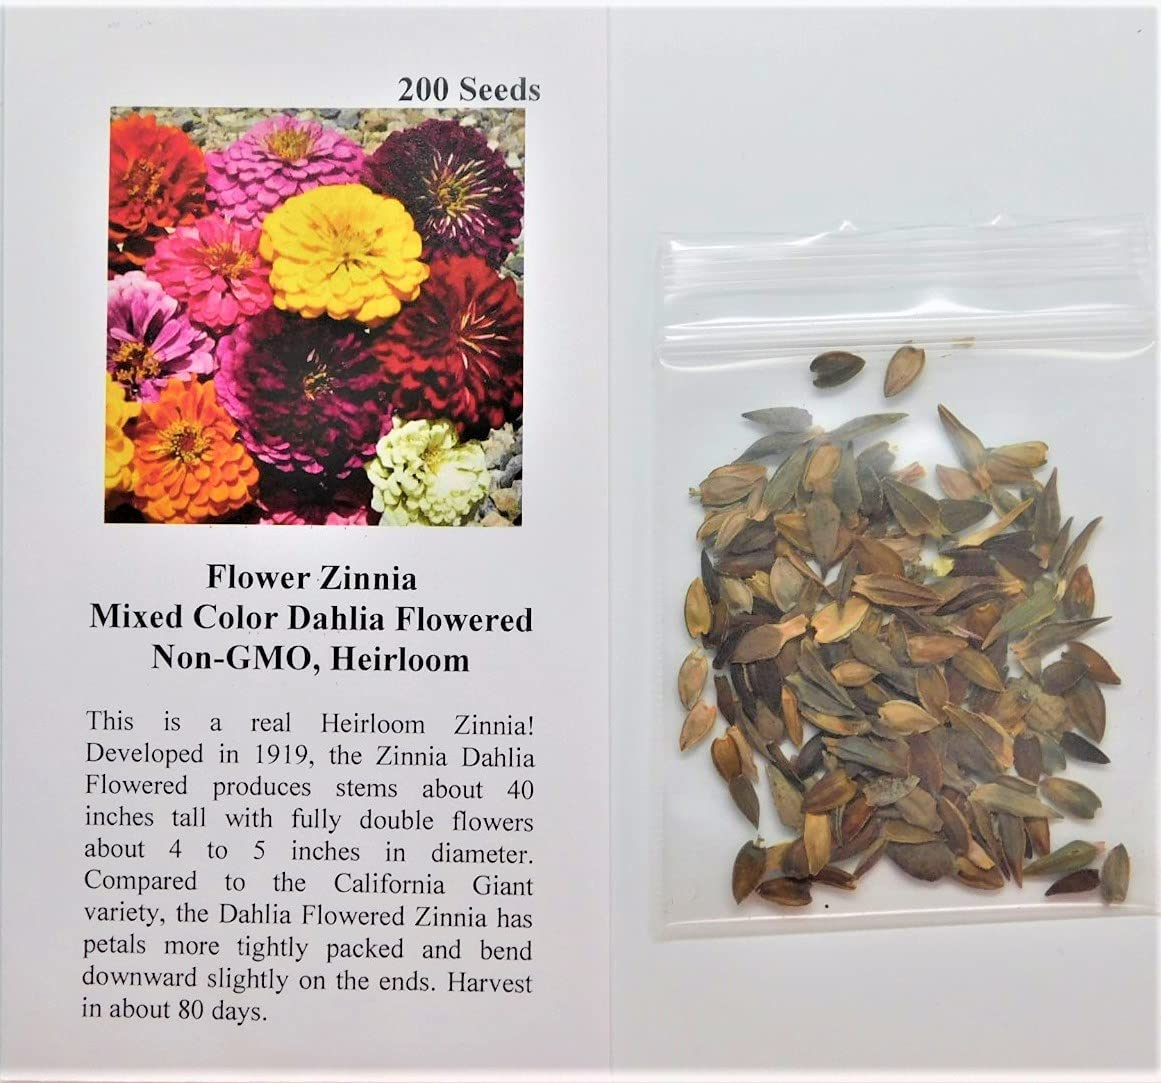 David's Garden Seeds Flower Zinnia Mixed Color Dahlia Flowered 1133 (Multi) 200 Non-GMO, Heirloom Seeds